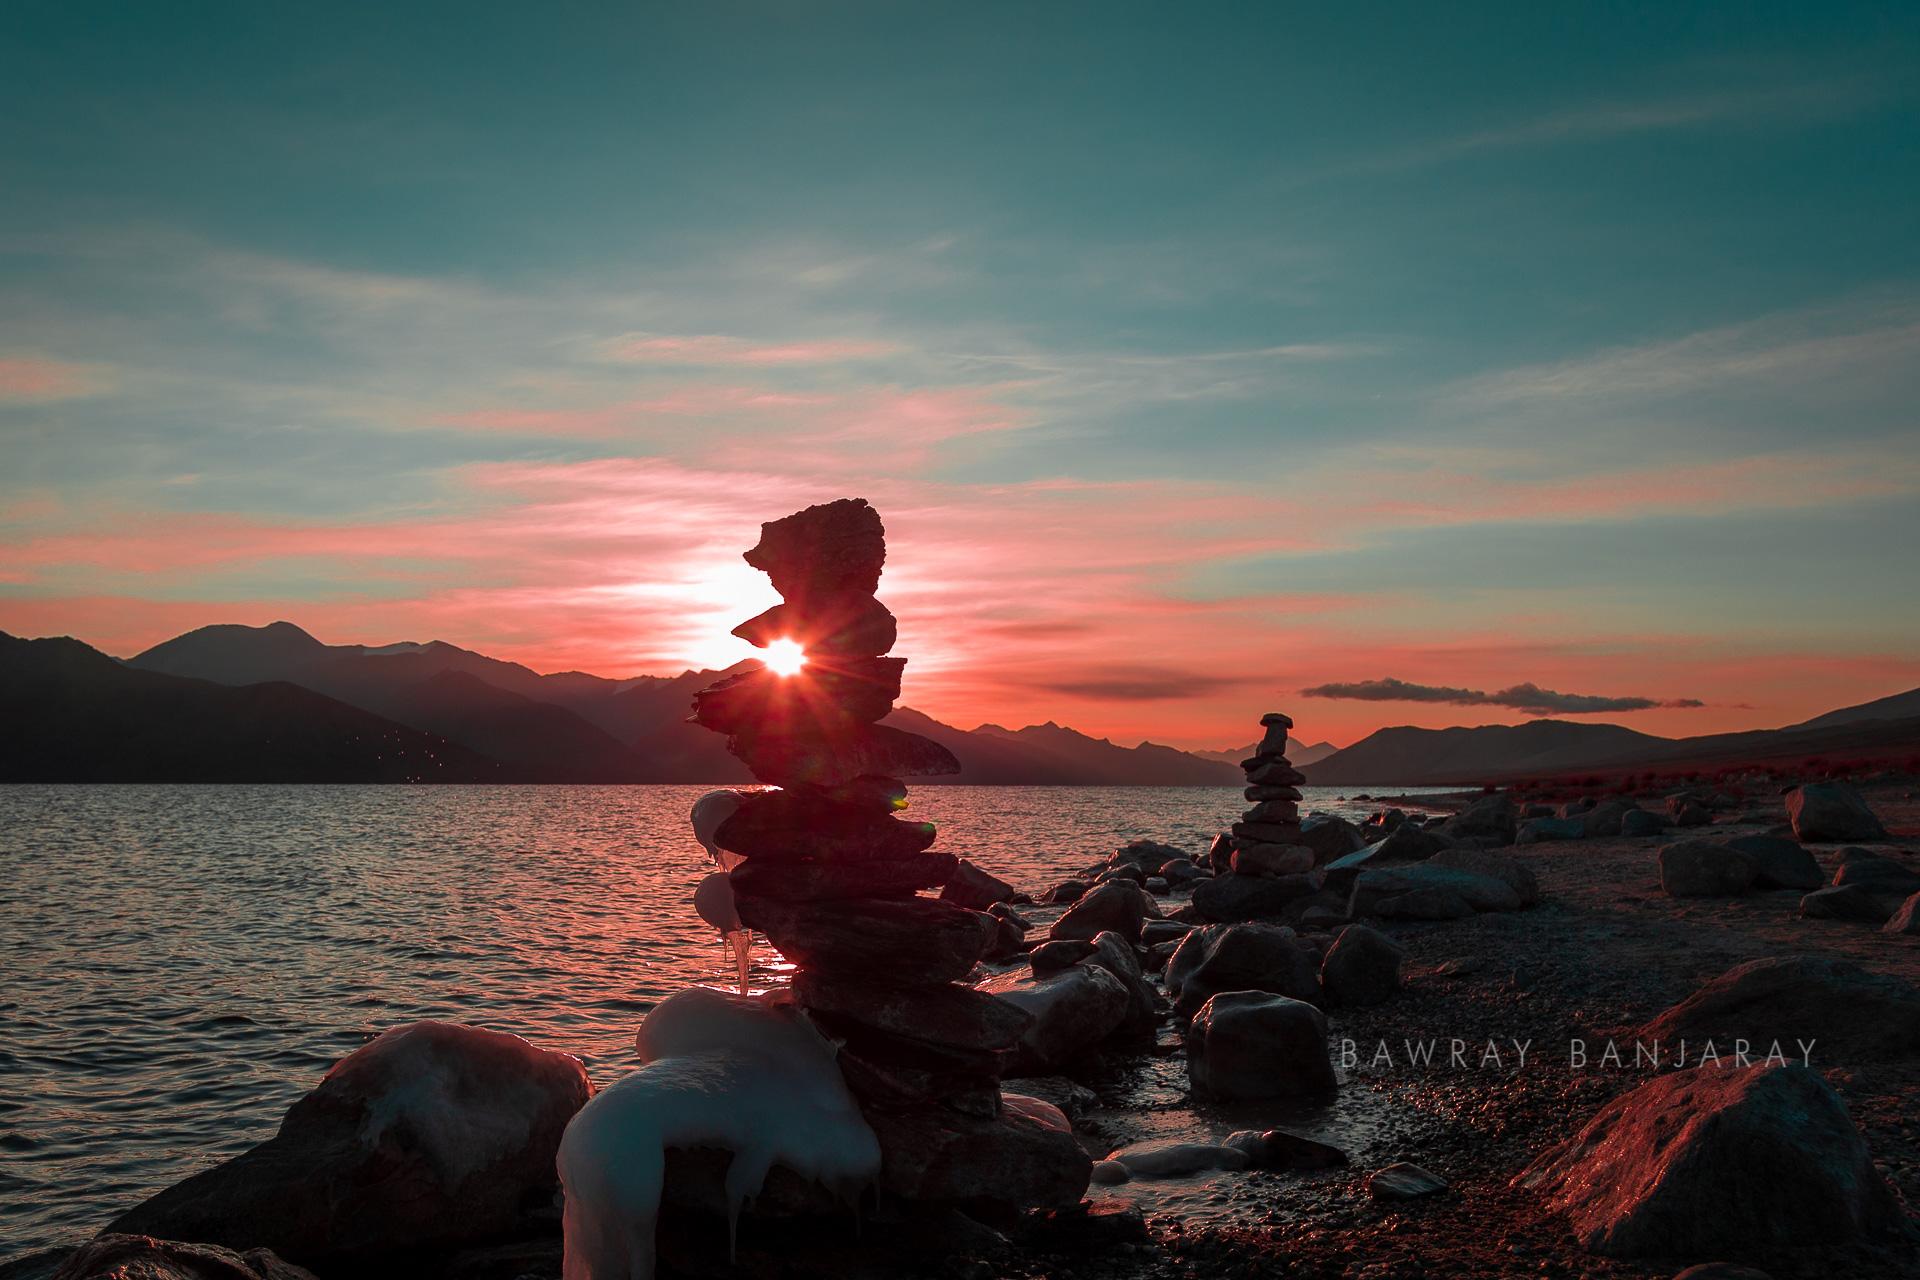 Sunset at Pangong Tso